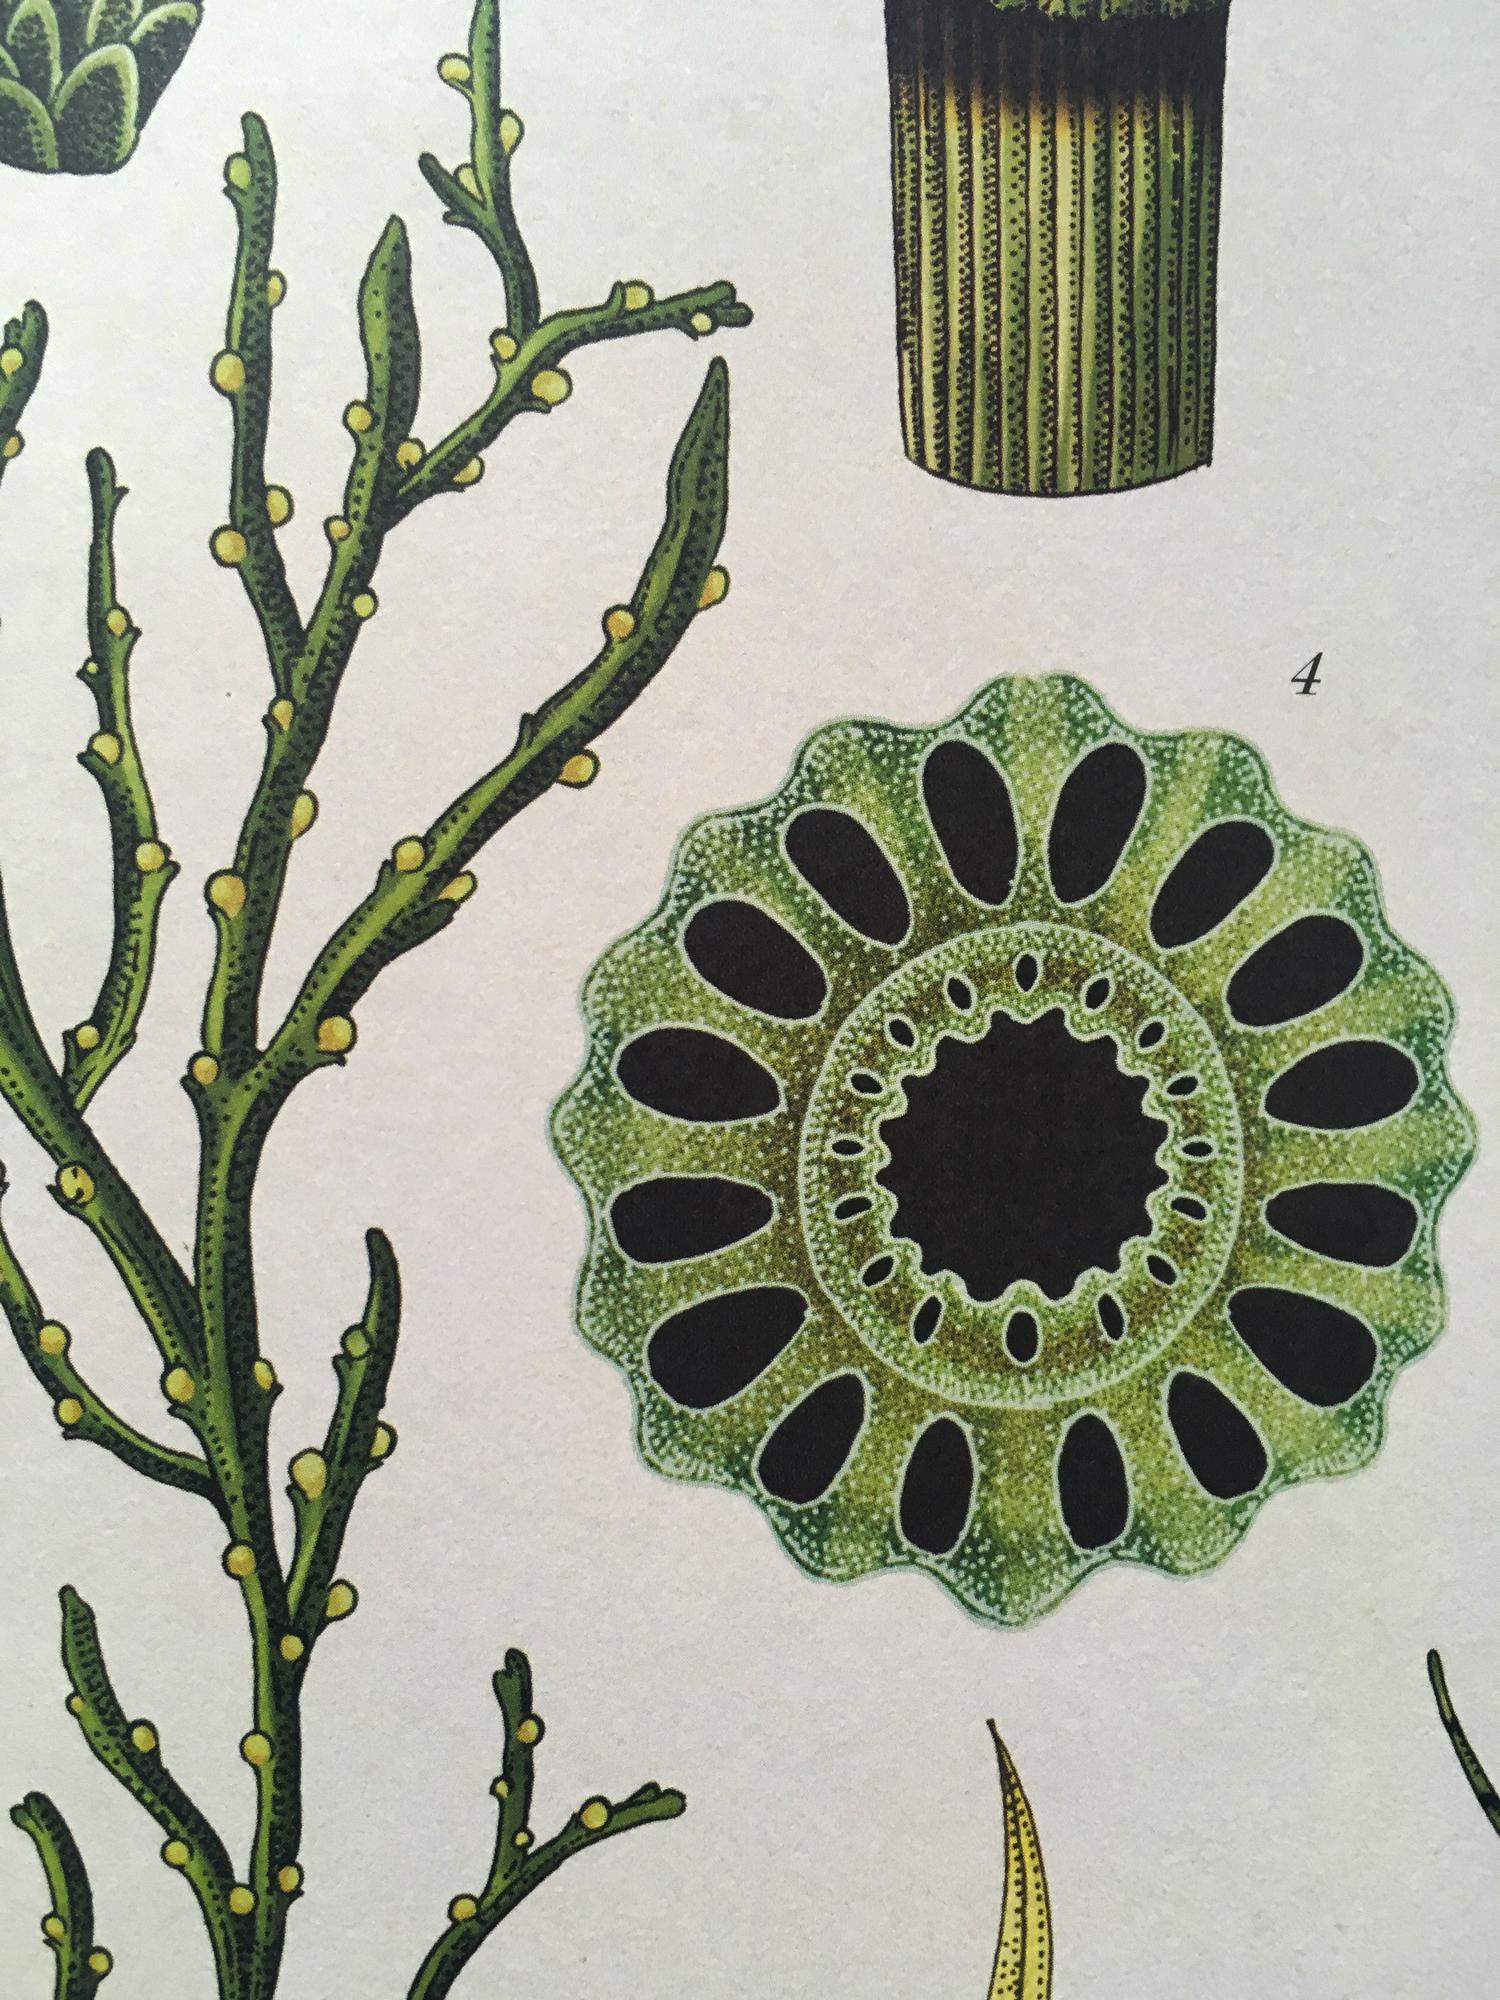 green-monsters-botanicum-9